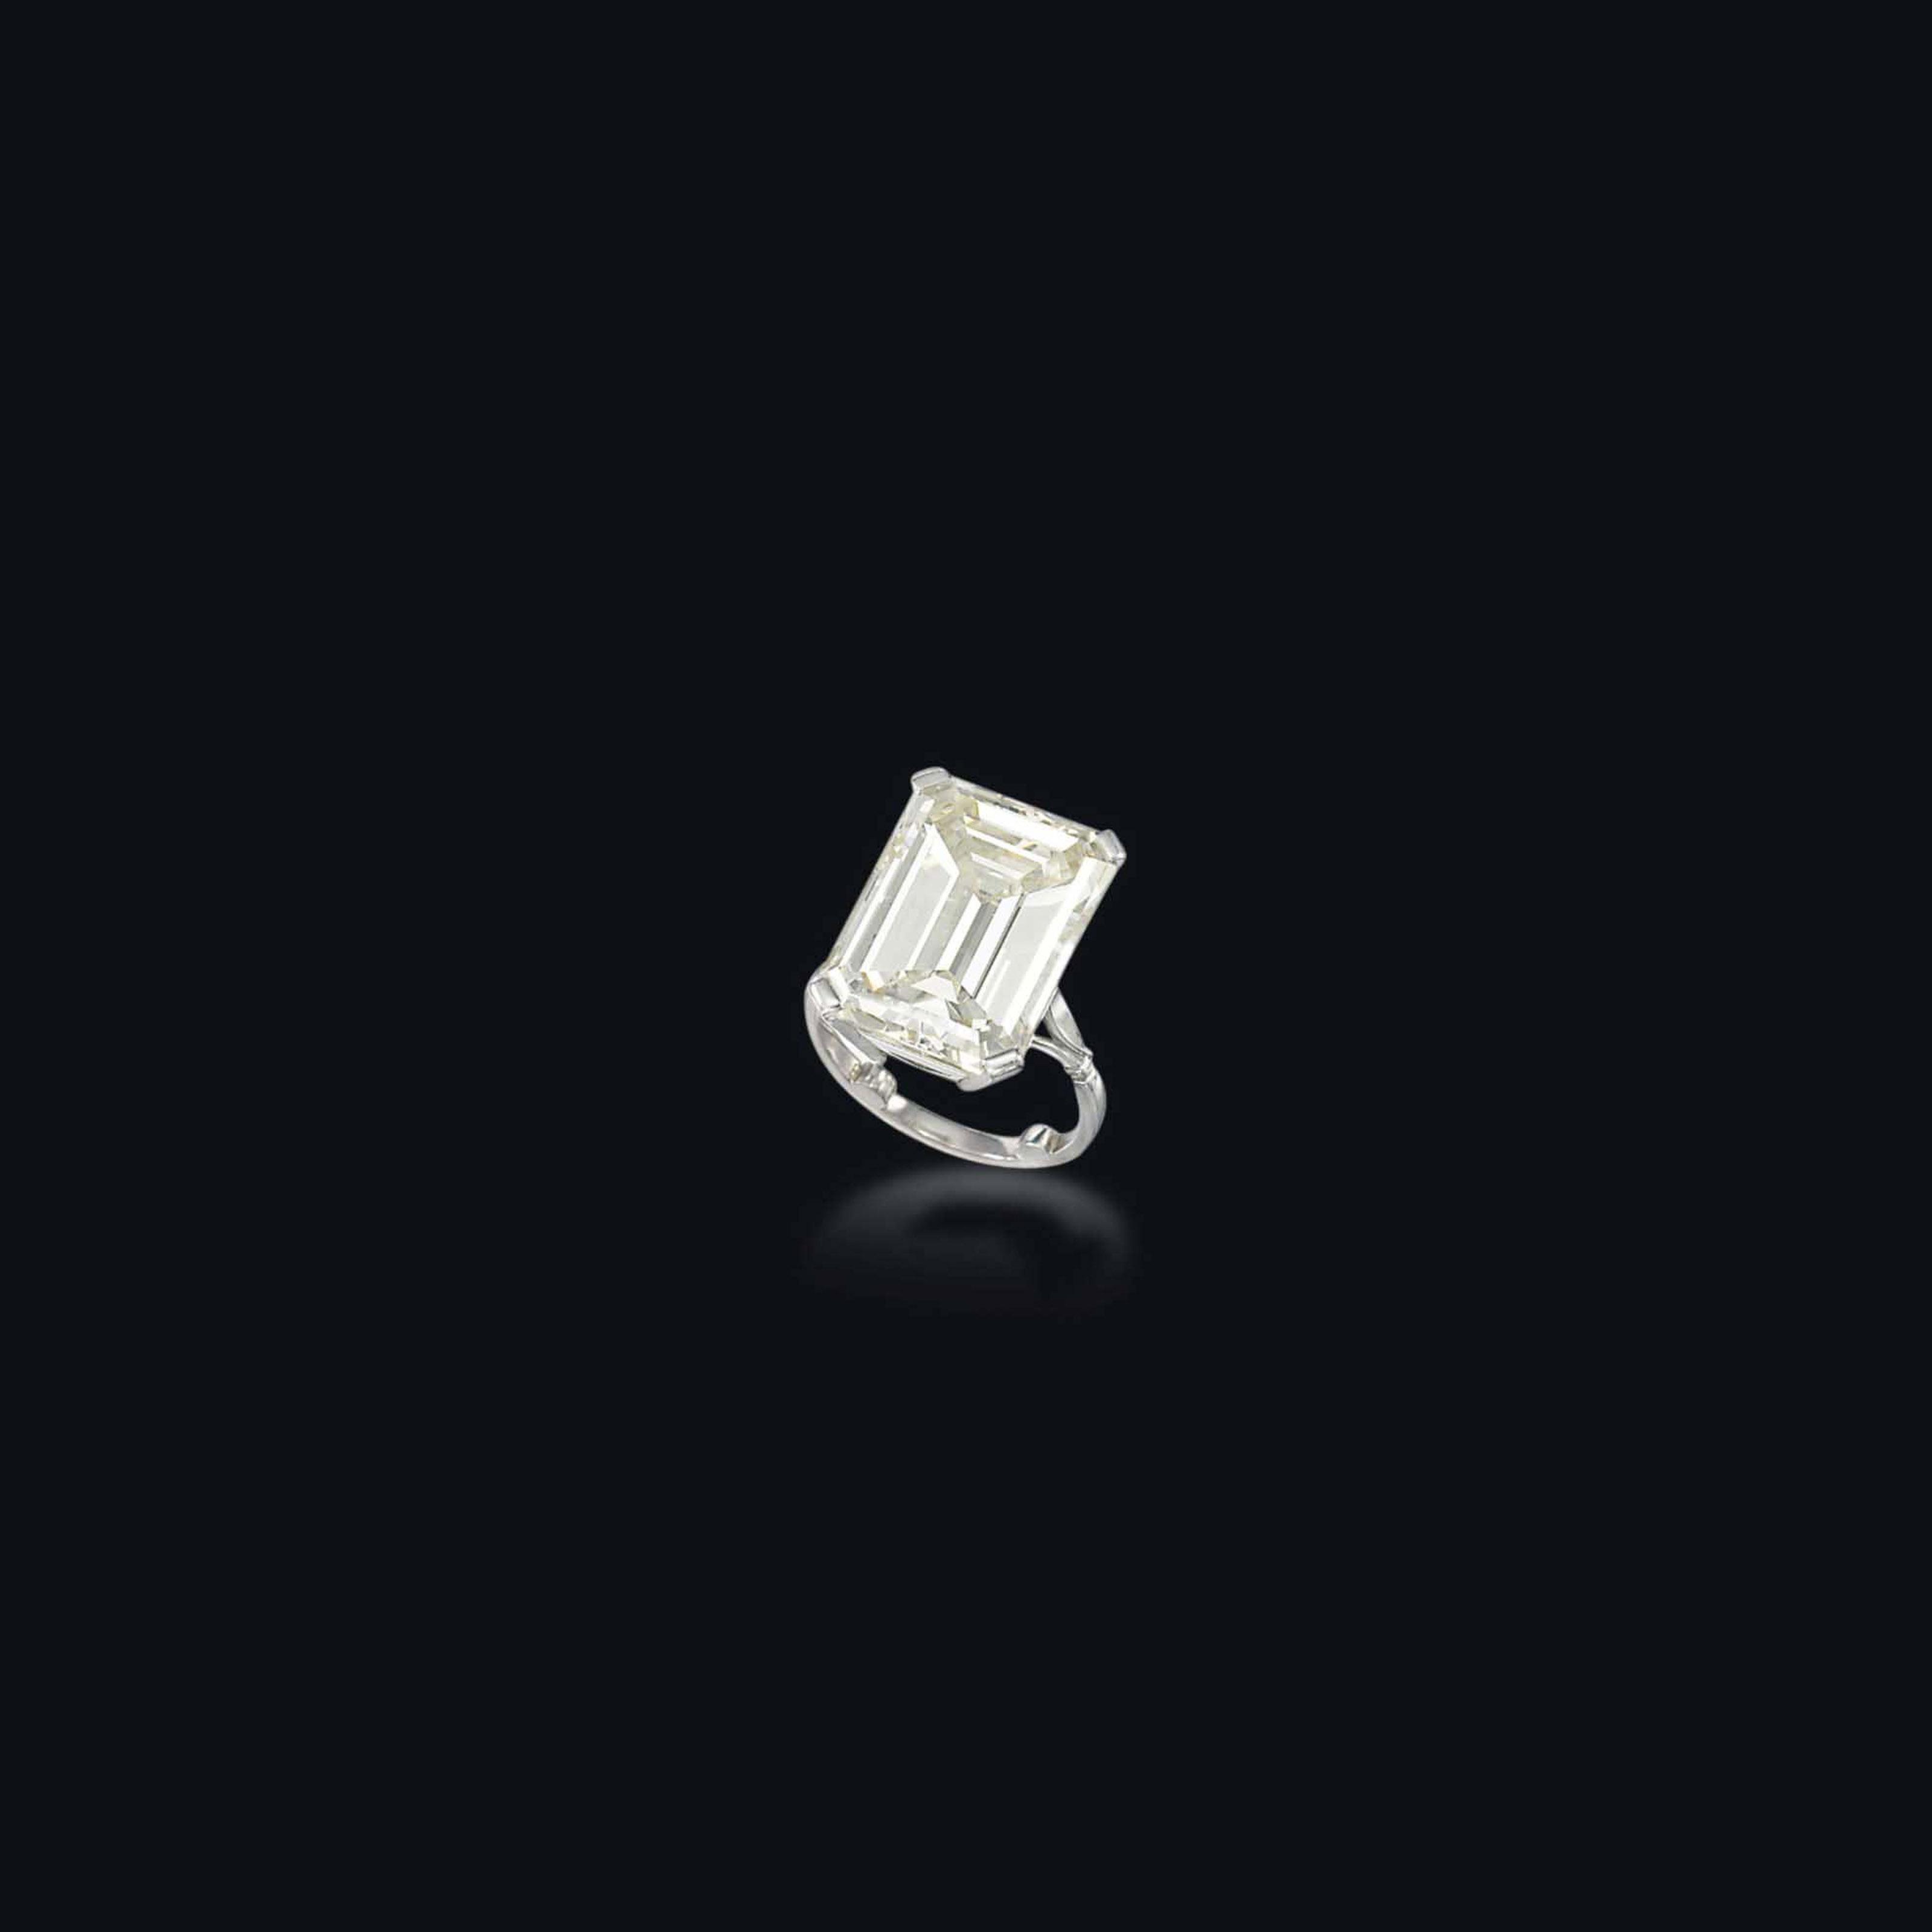 AN IMPRESSIVE DIAMOND SINGLE-STONE RING, BY GUBELIN